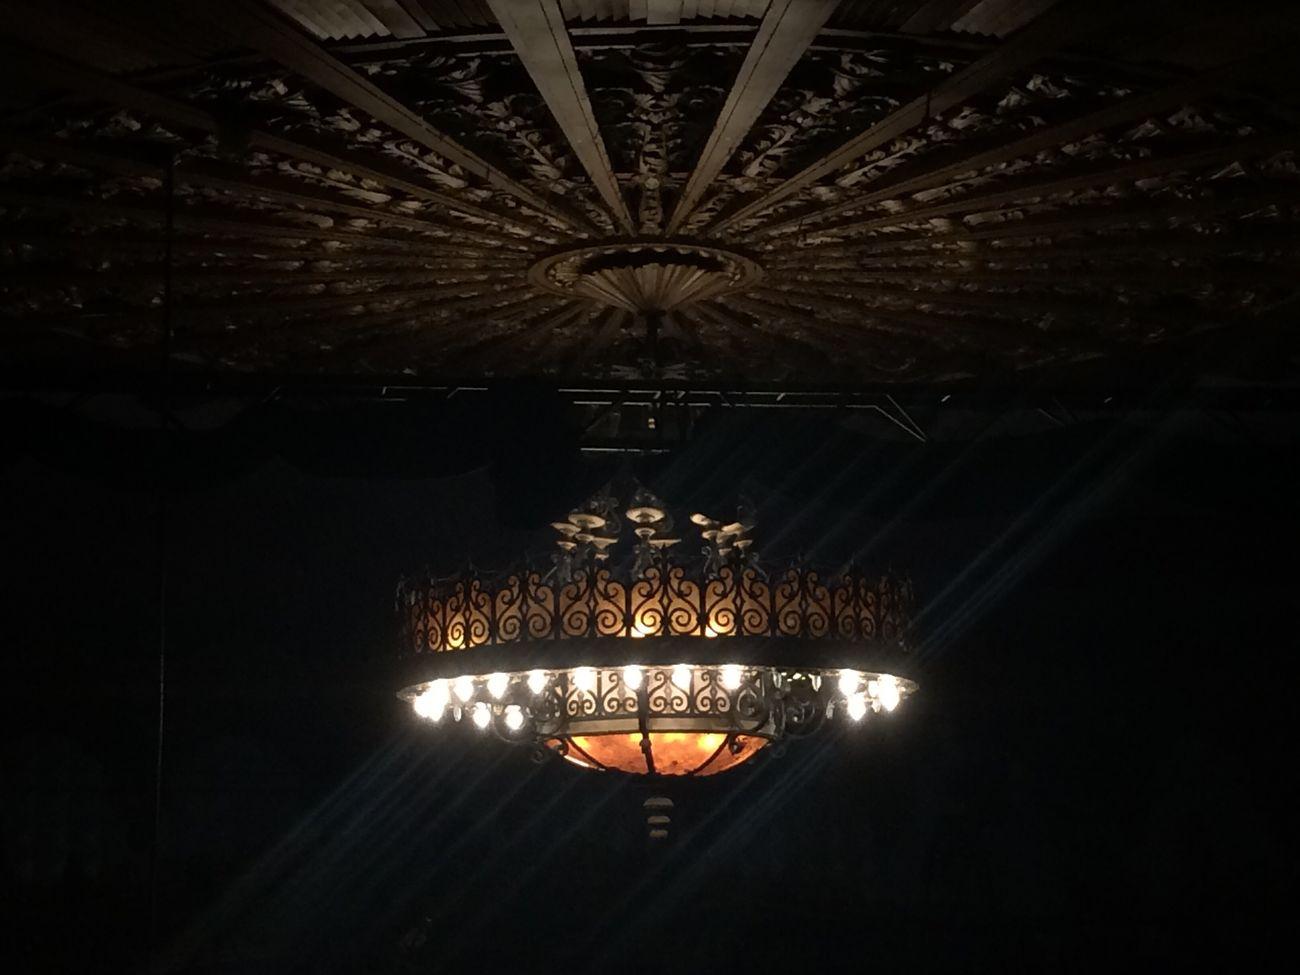 Illuminated Indoors  Architecture Built Structure Architecture Ceiling Architecture Details Architecture Photography Architectural Detail Light Beam Design Lights Lighting Light Rays Cieling Chandelier Architecture Art Deco Architecture Art Deco Light Beams Interior Beautiful Light Vintage Lighting Equipment Light And Shadow Light